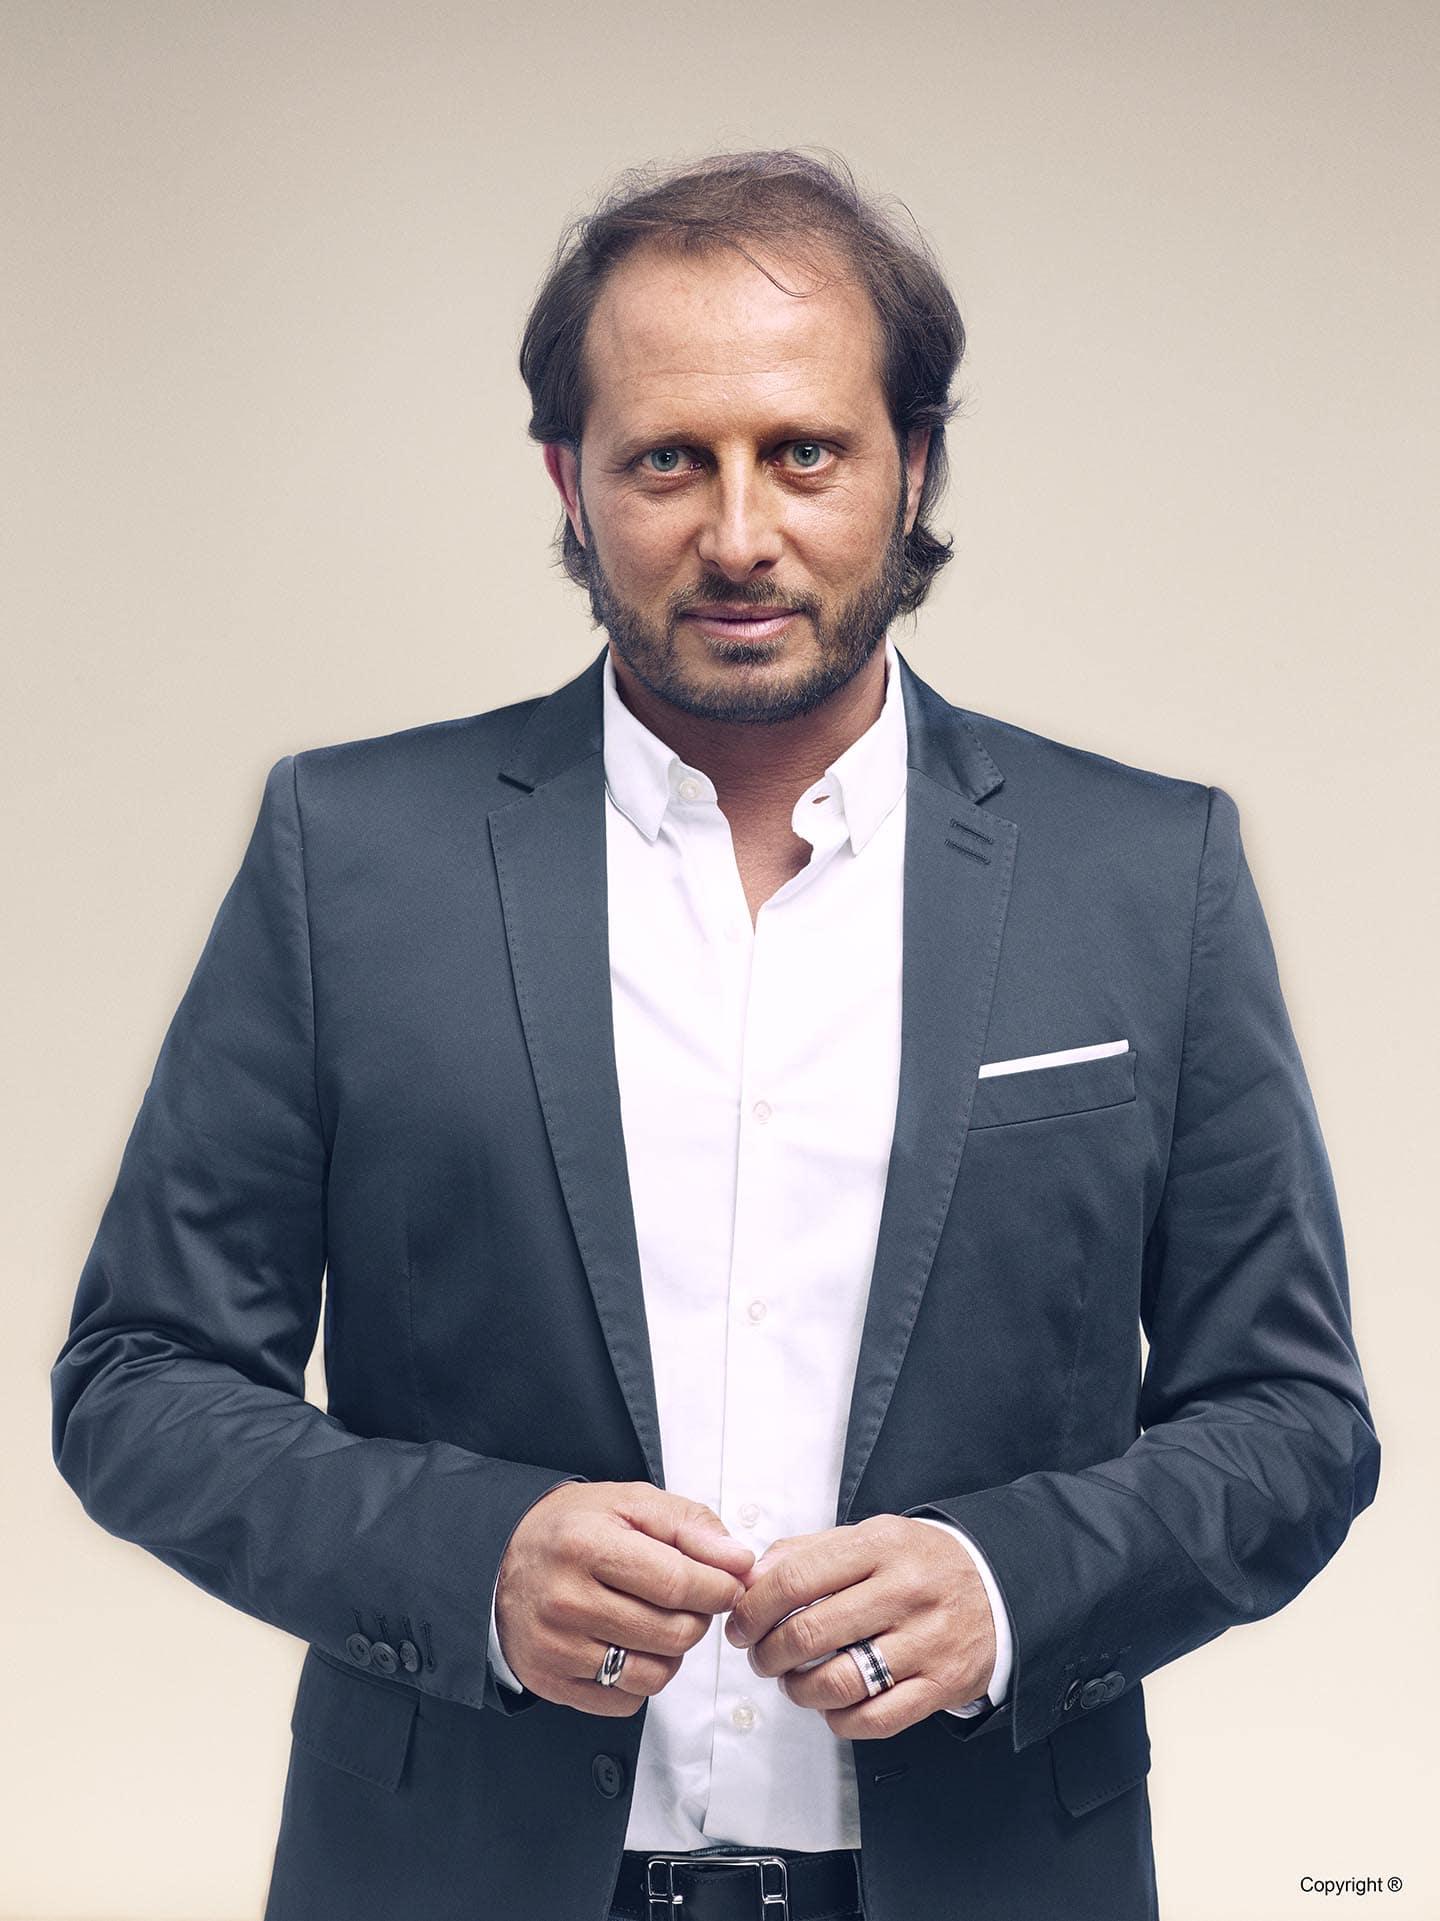 Maître Parfumeur Fabrice Pellegrin